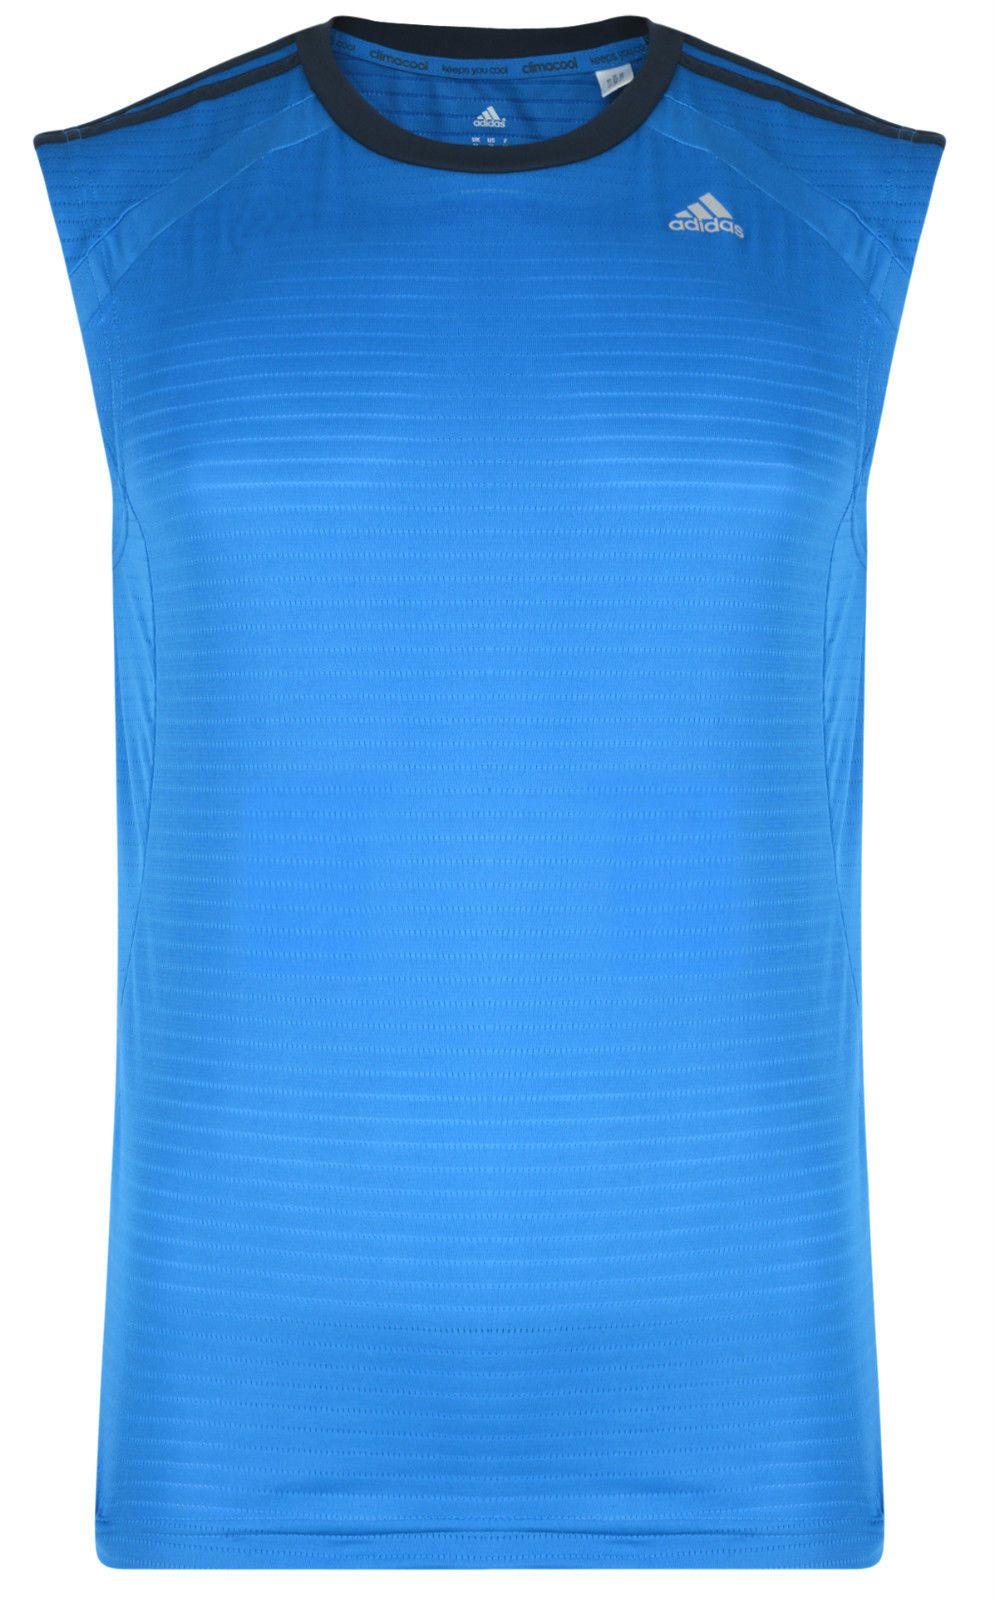 Climacool Shirt Adidas New Mens Top Running Vest T Sleeveless 8BEPSwqPv